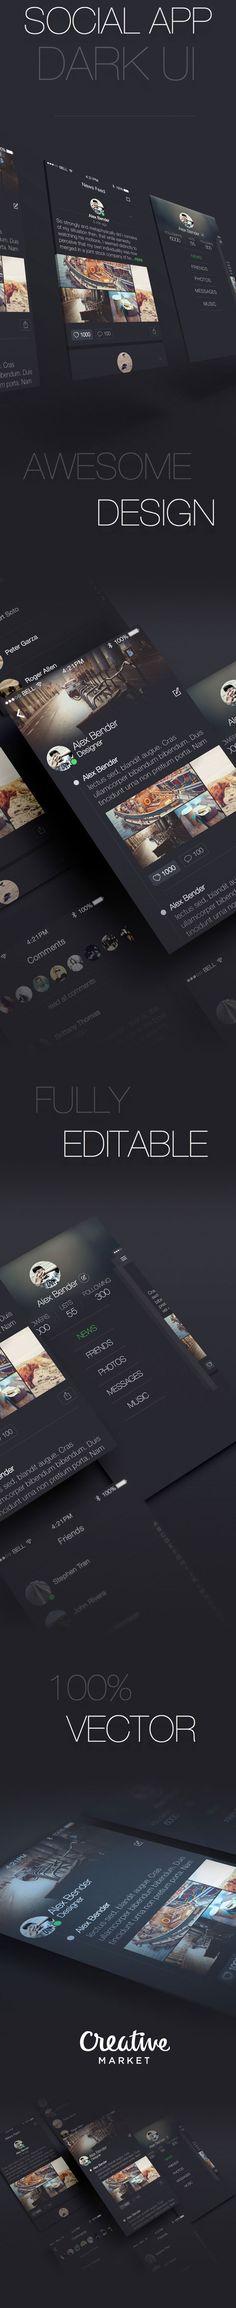 Daily Mobile UI Design Inspiration #348 / dark design / dark graphic design ideas